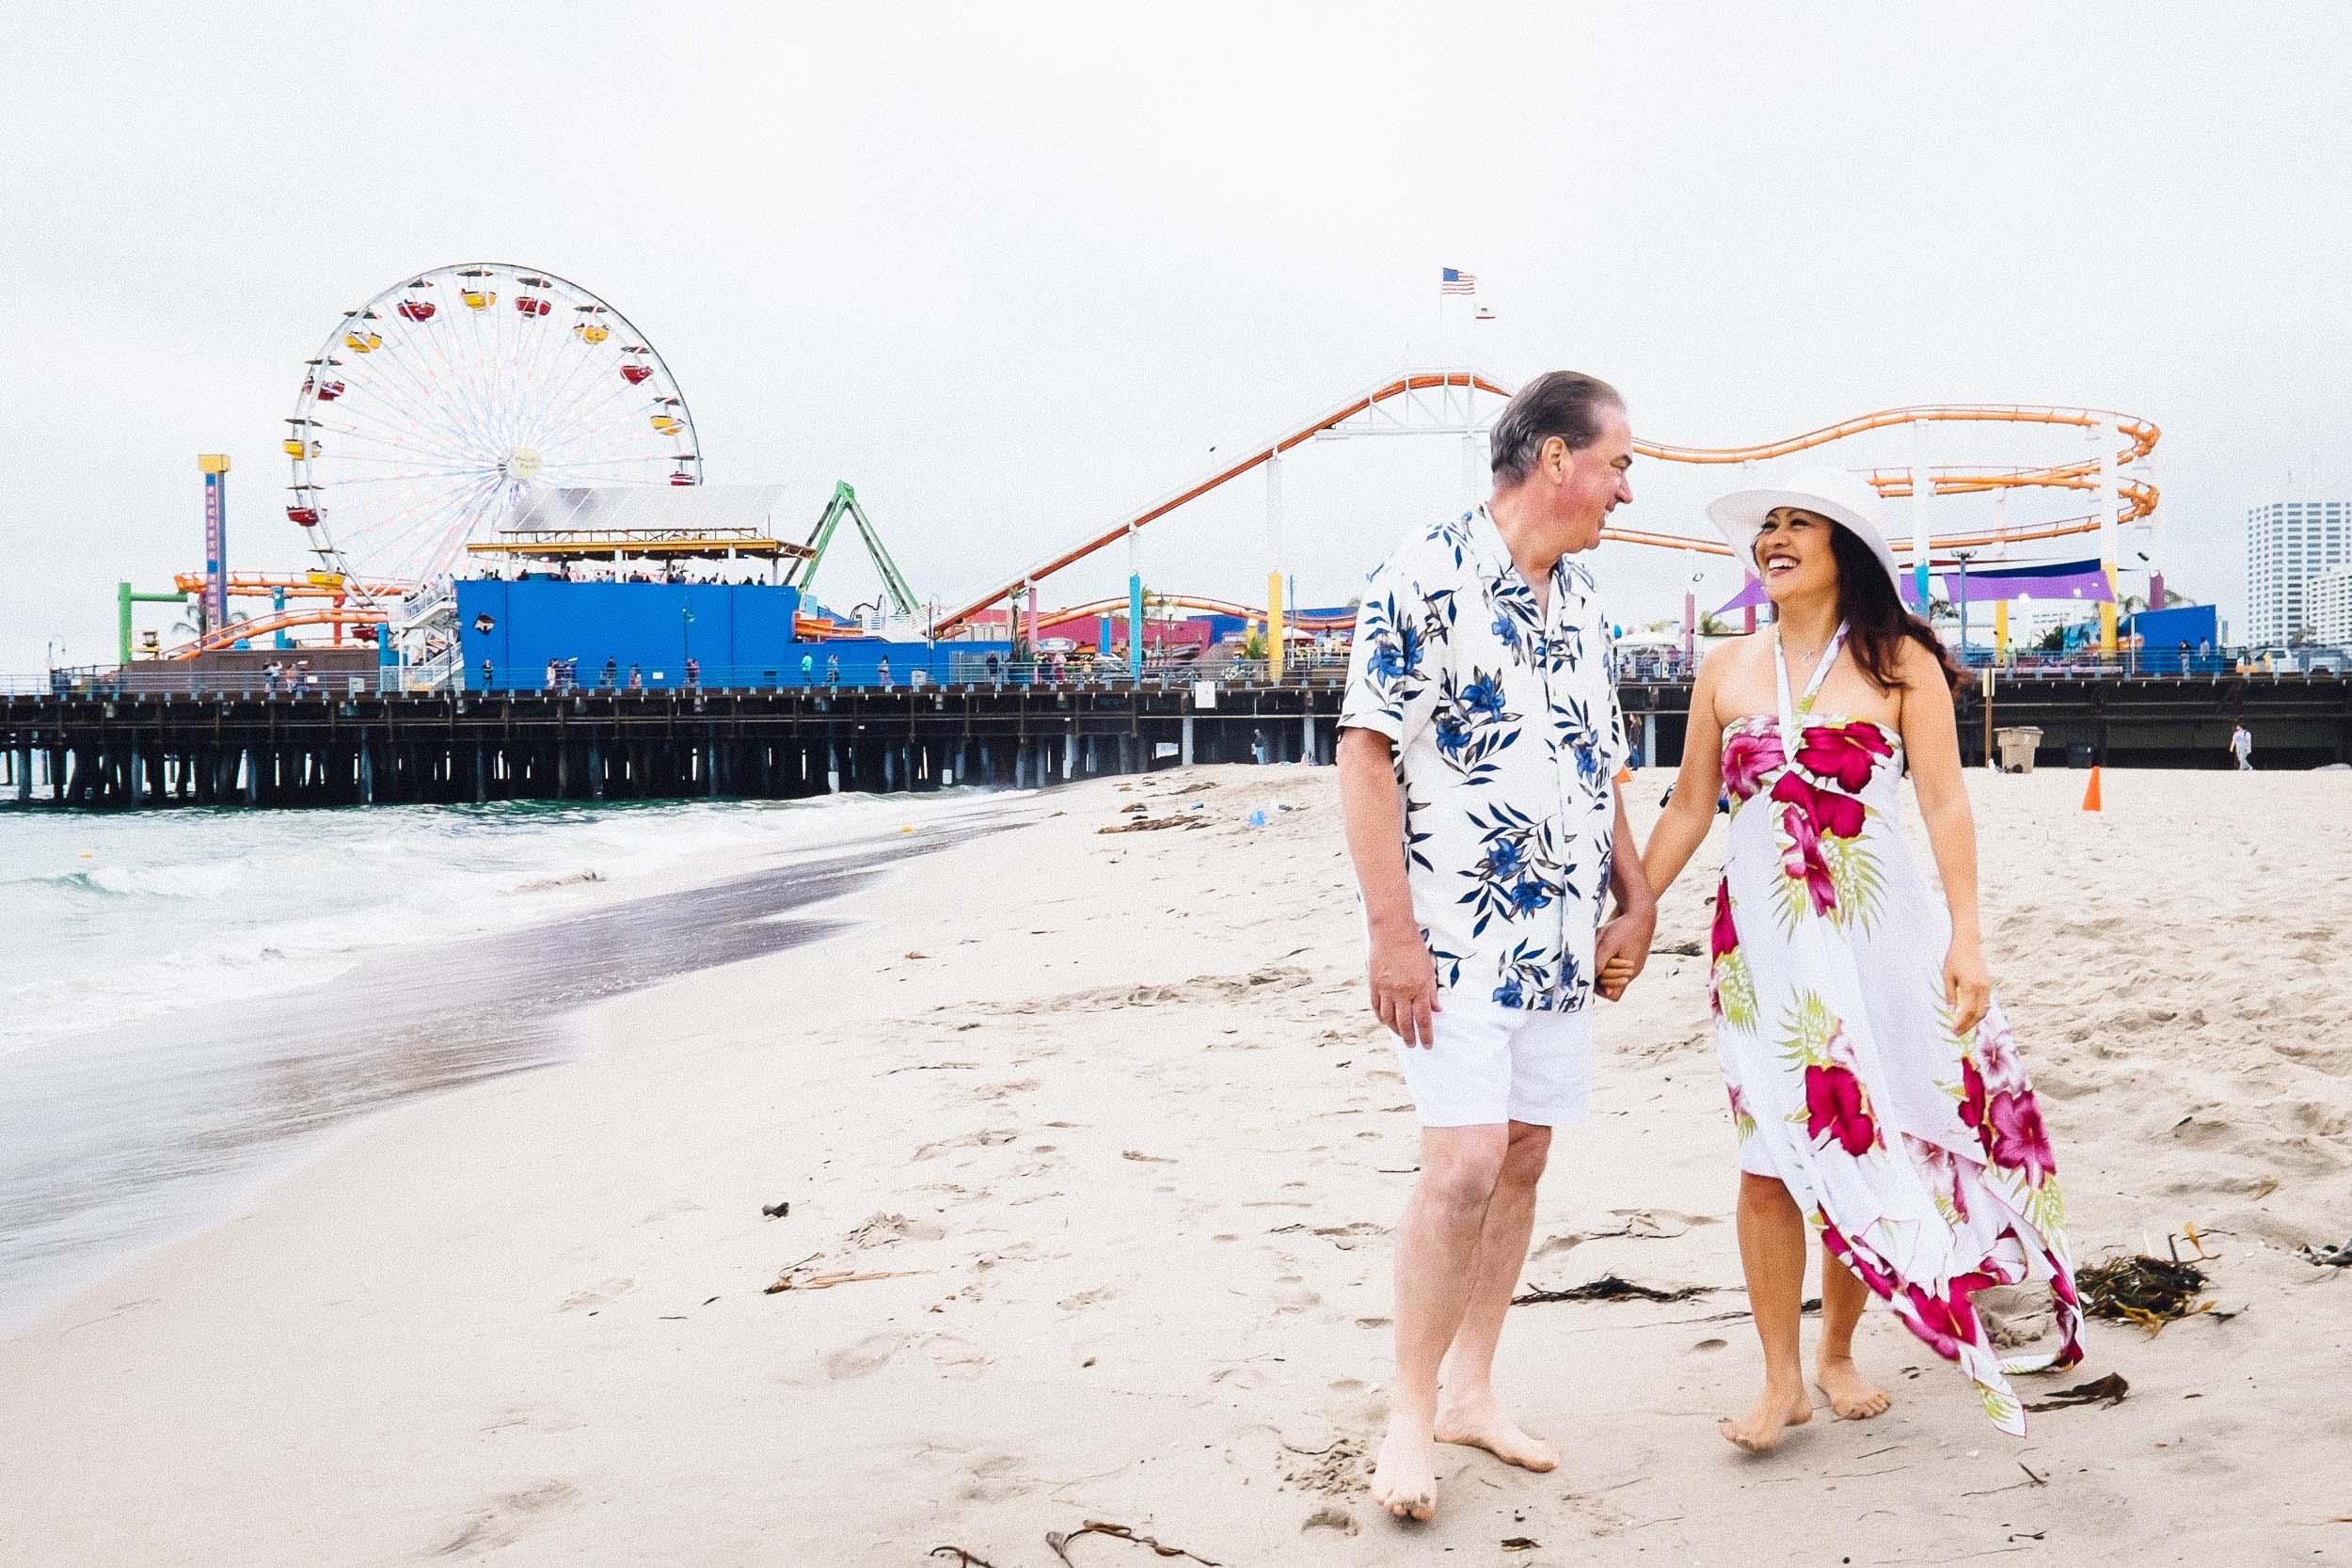 Bryan-Miraflor-Photography-Rose-Engagement-Photoshoot-20150613-0236.jpg